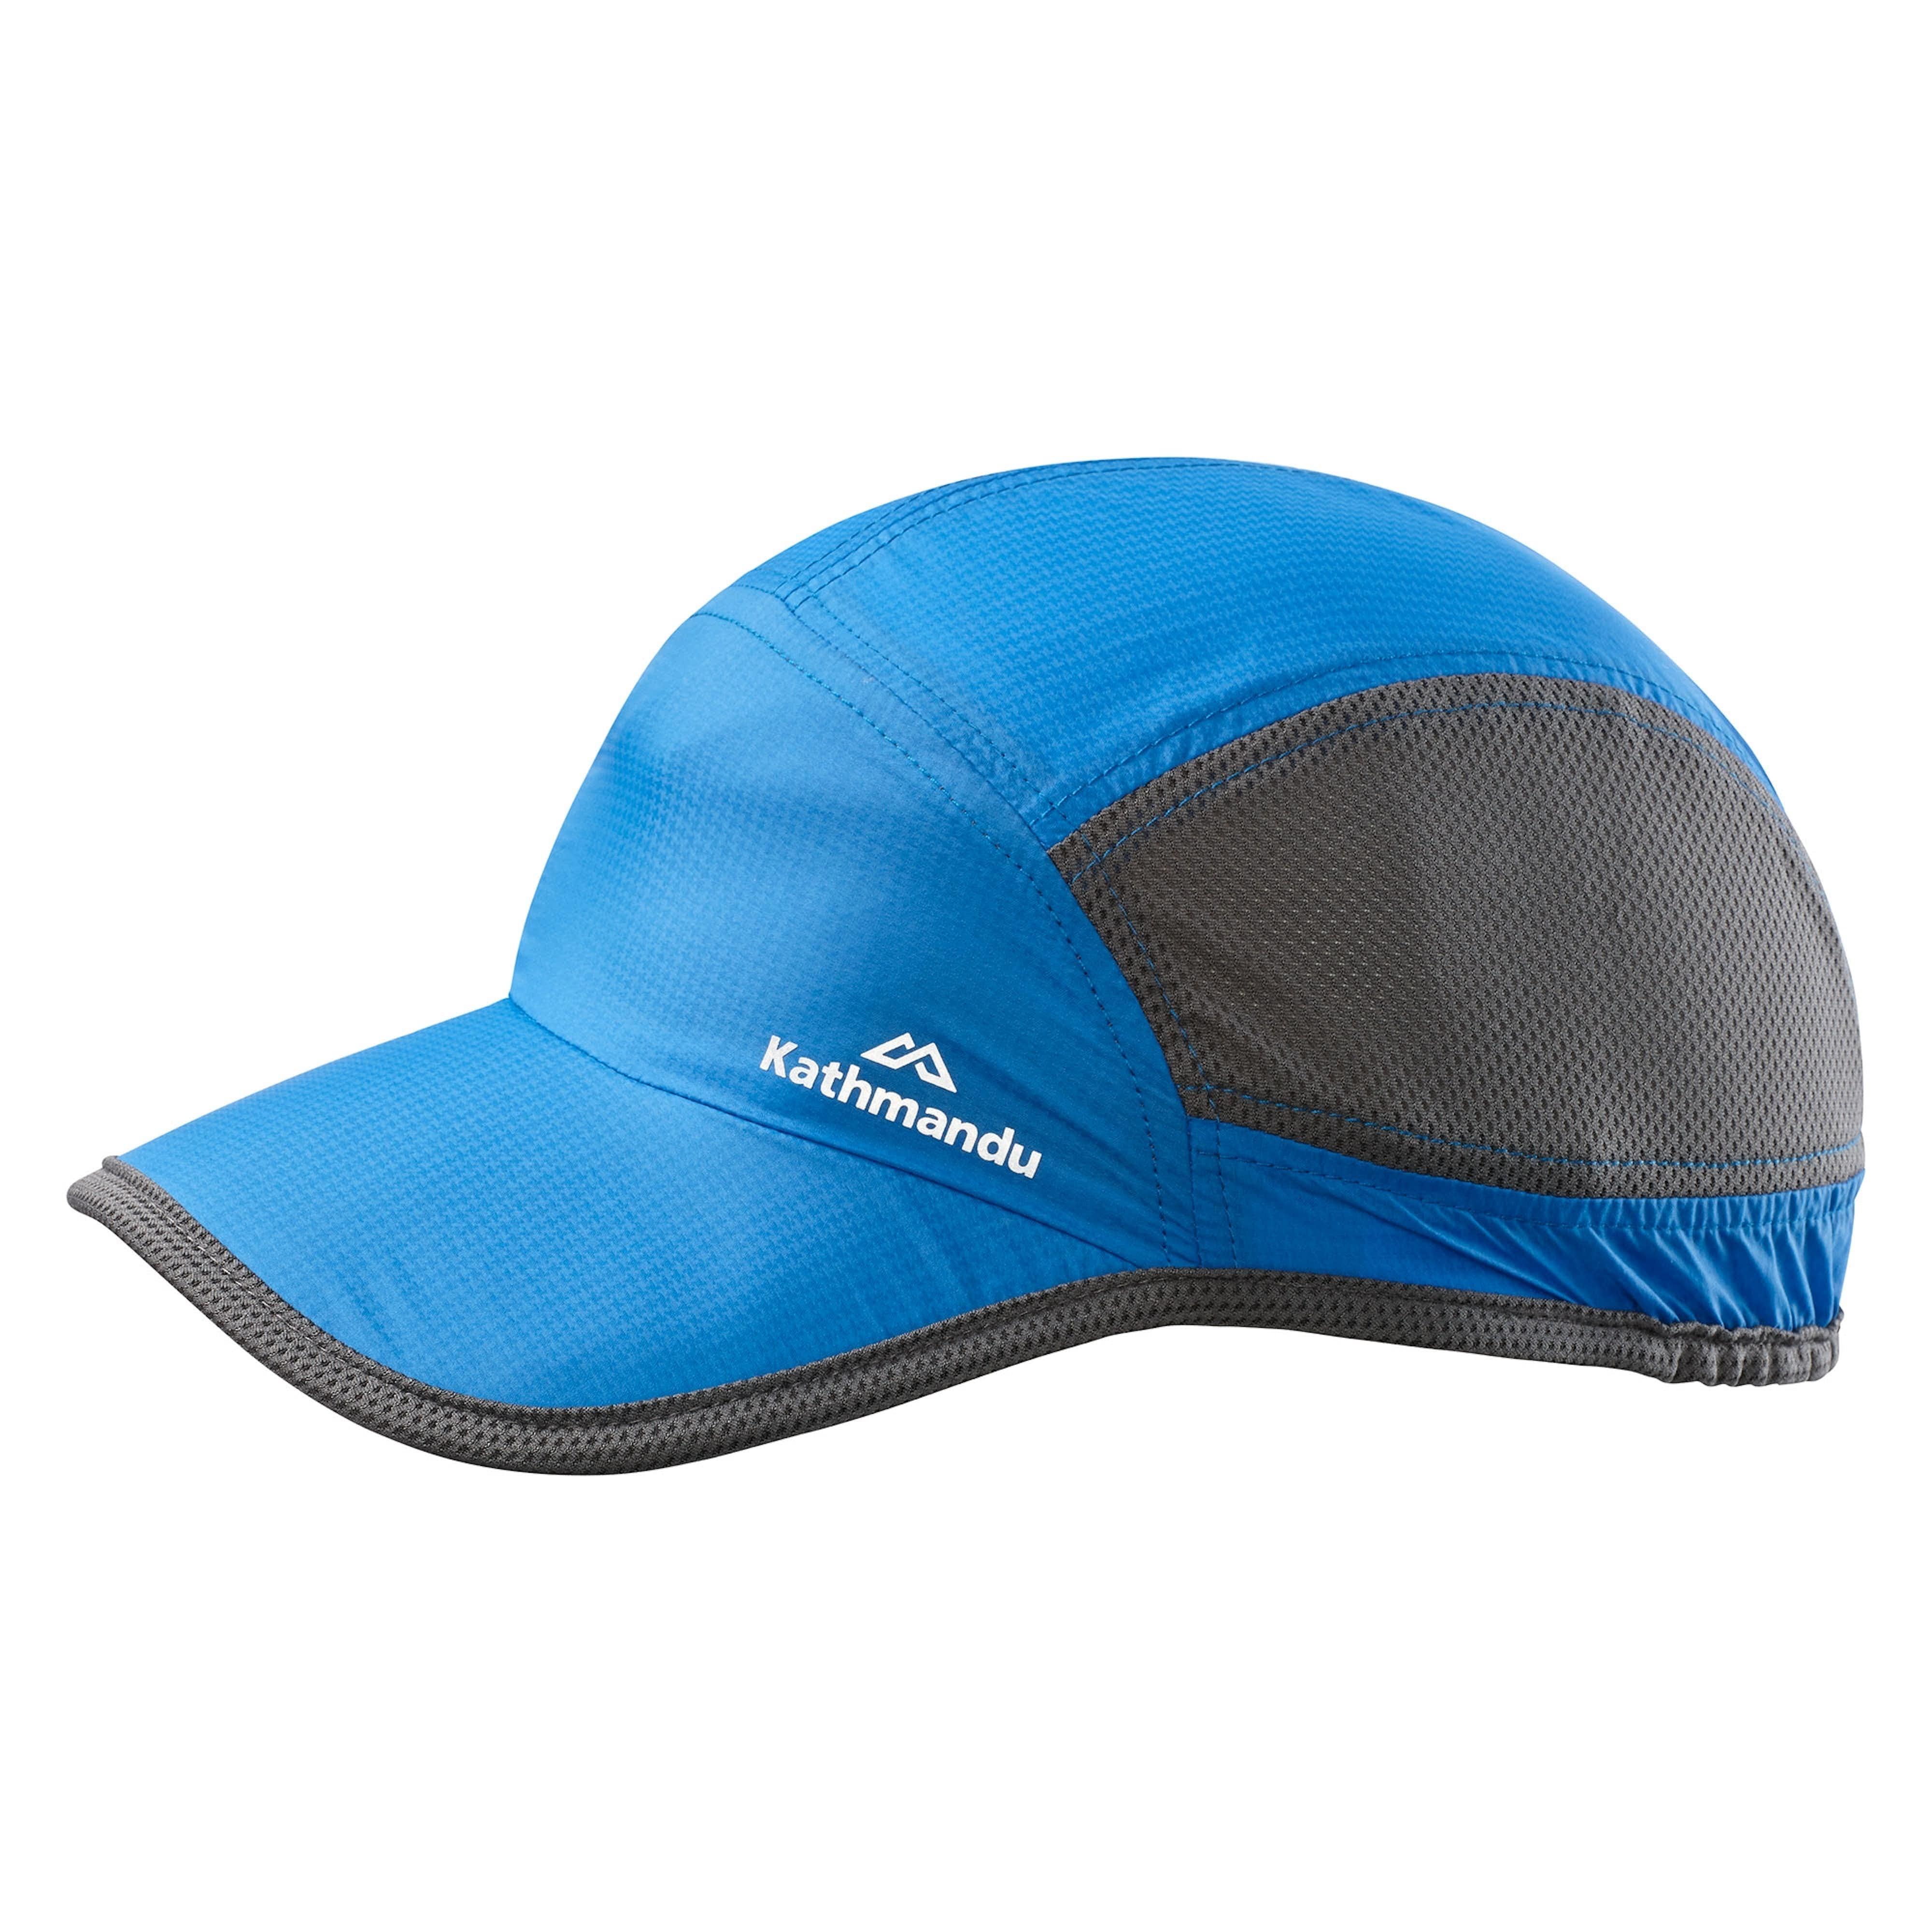 Mens Hats, Beanies & Caps   Scarves & Neck Gaiters for Men   NZ